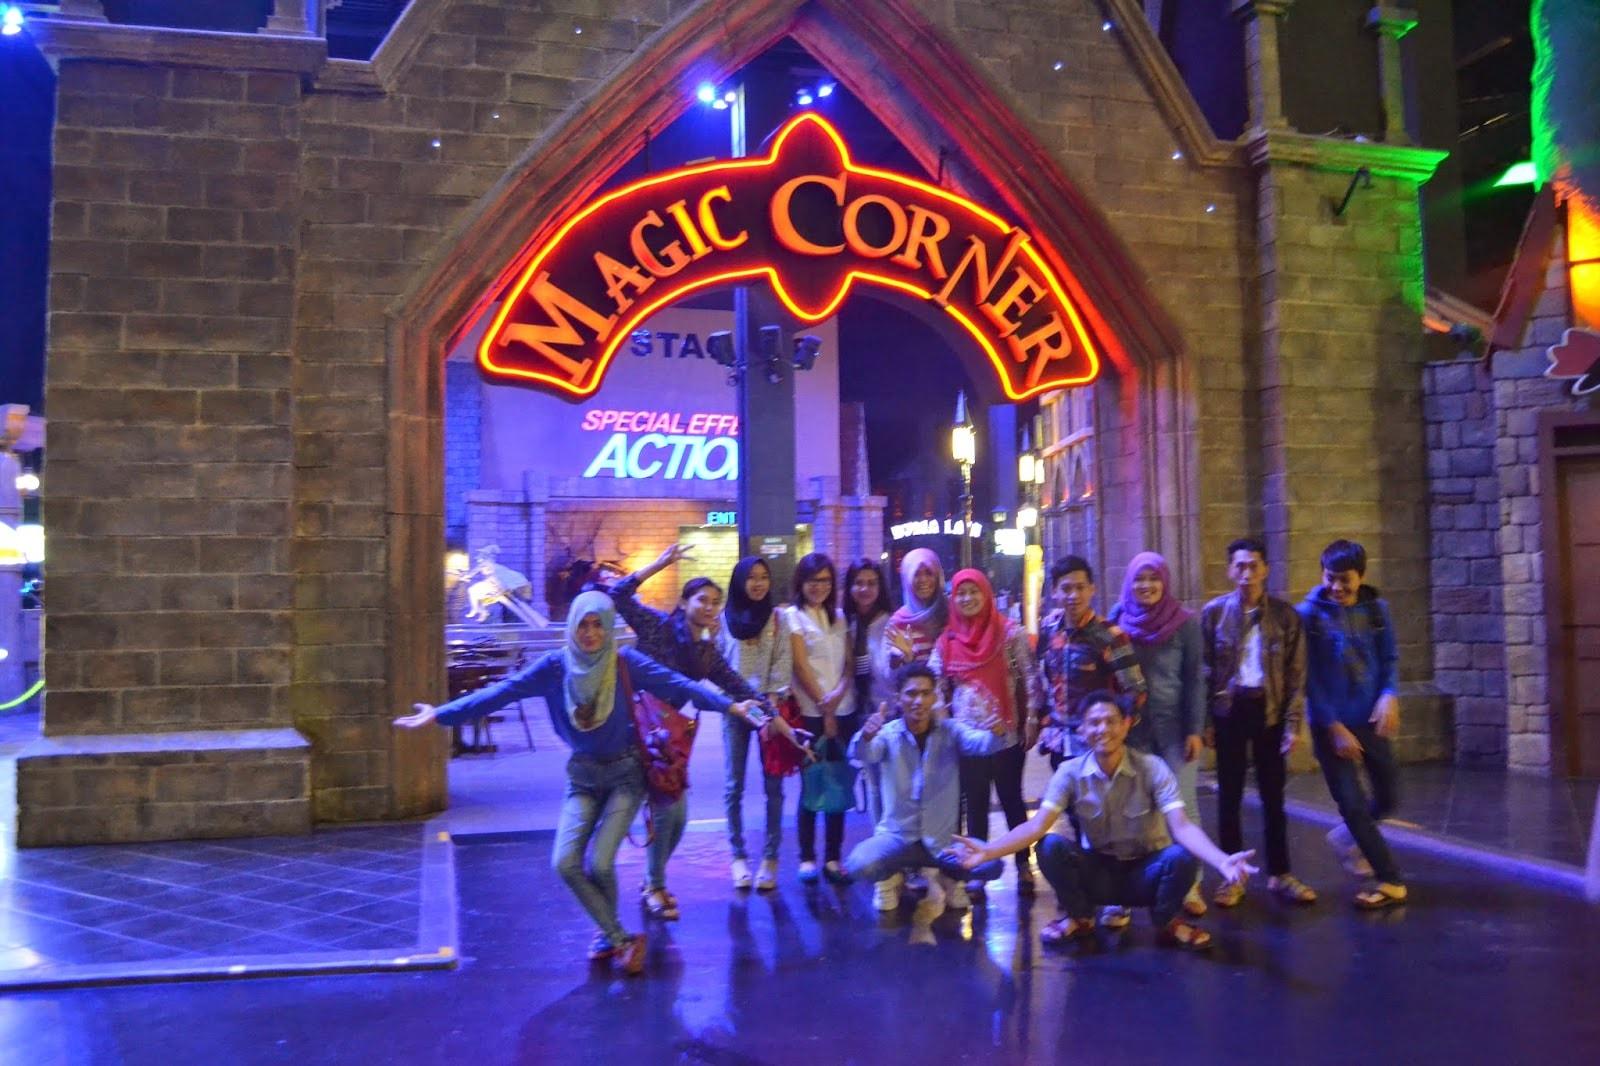 magic corner trans studio bandung